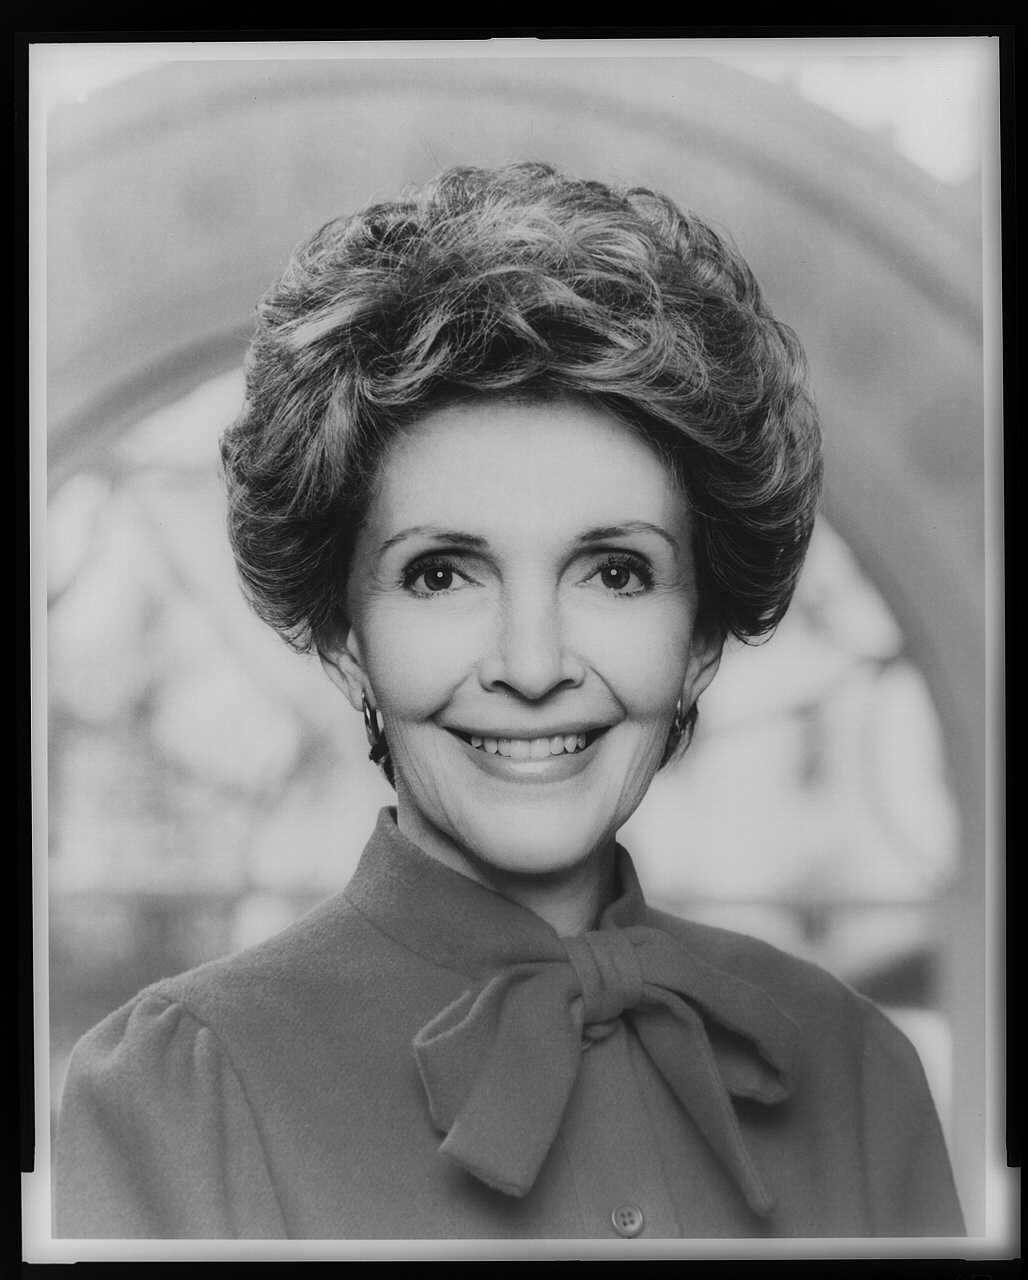 Nancy Reagan, head-and-shoulders portrait, facing front